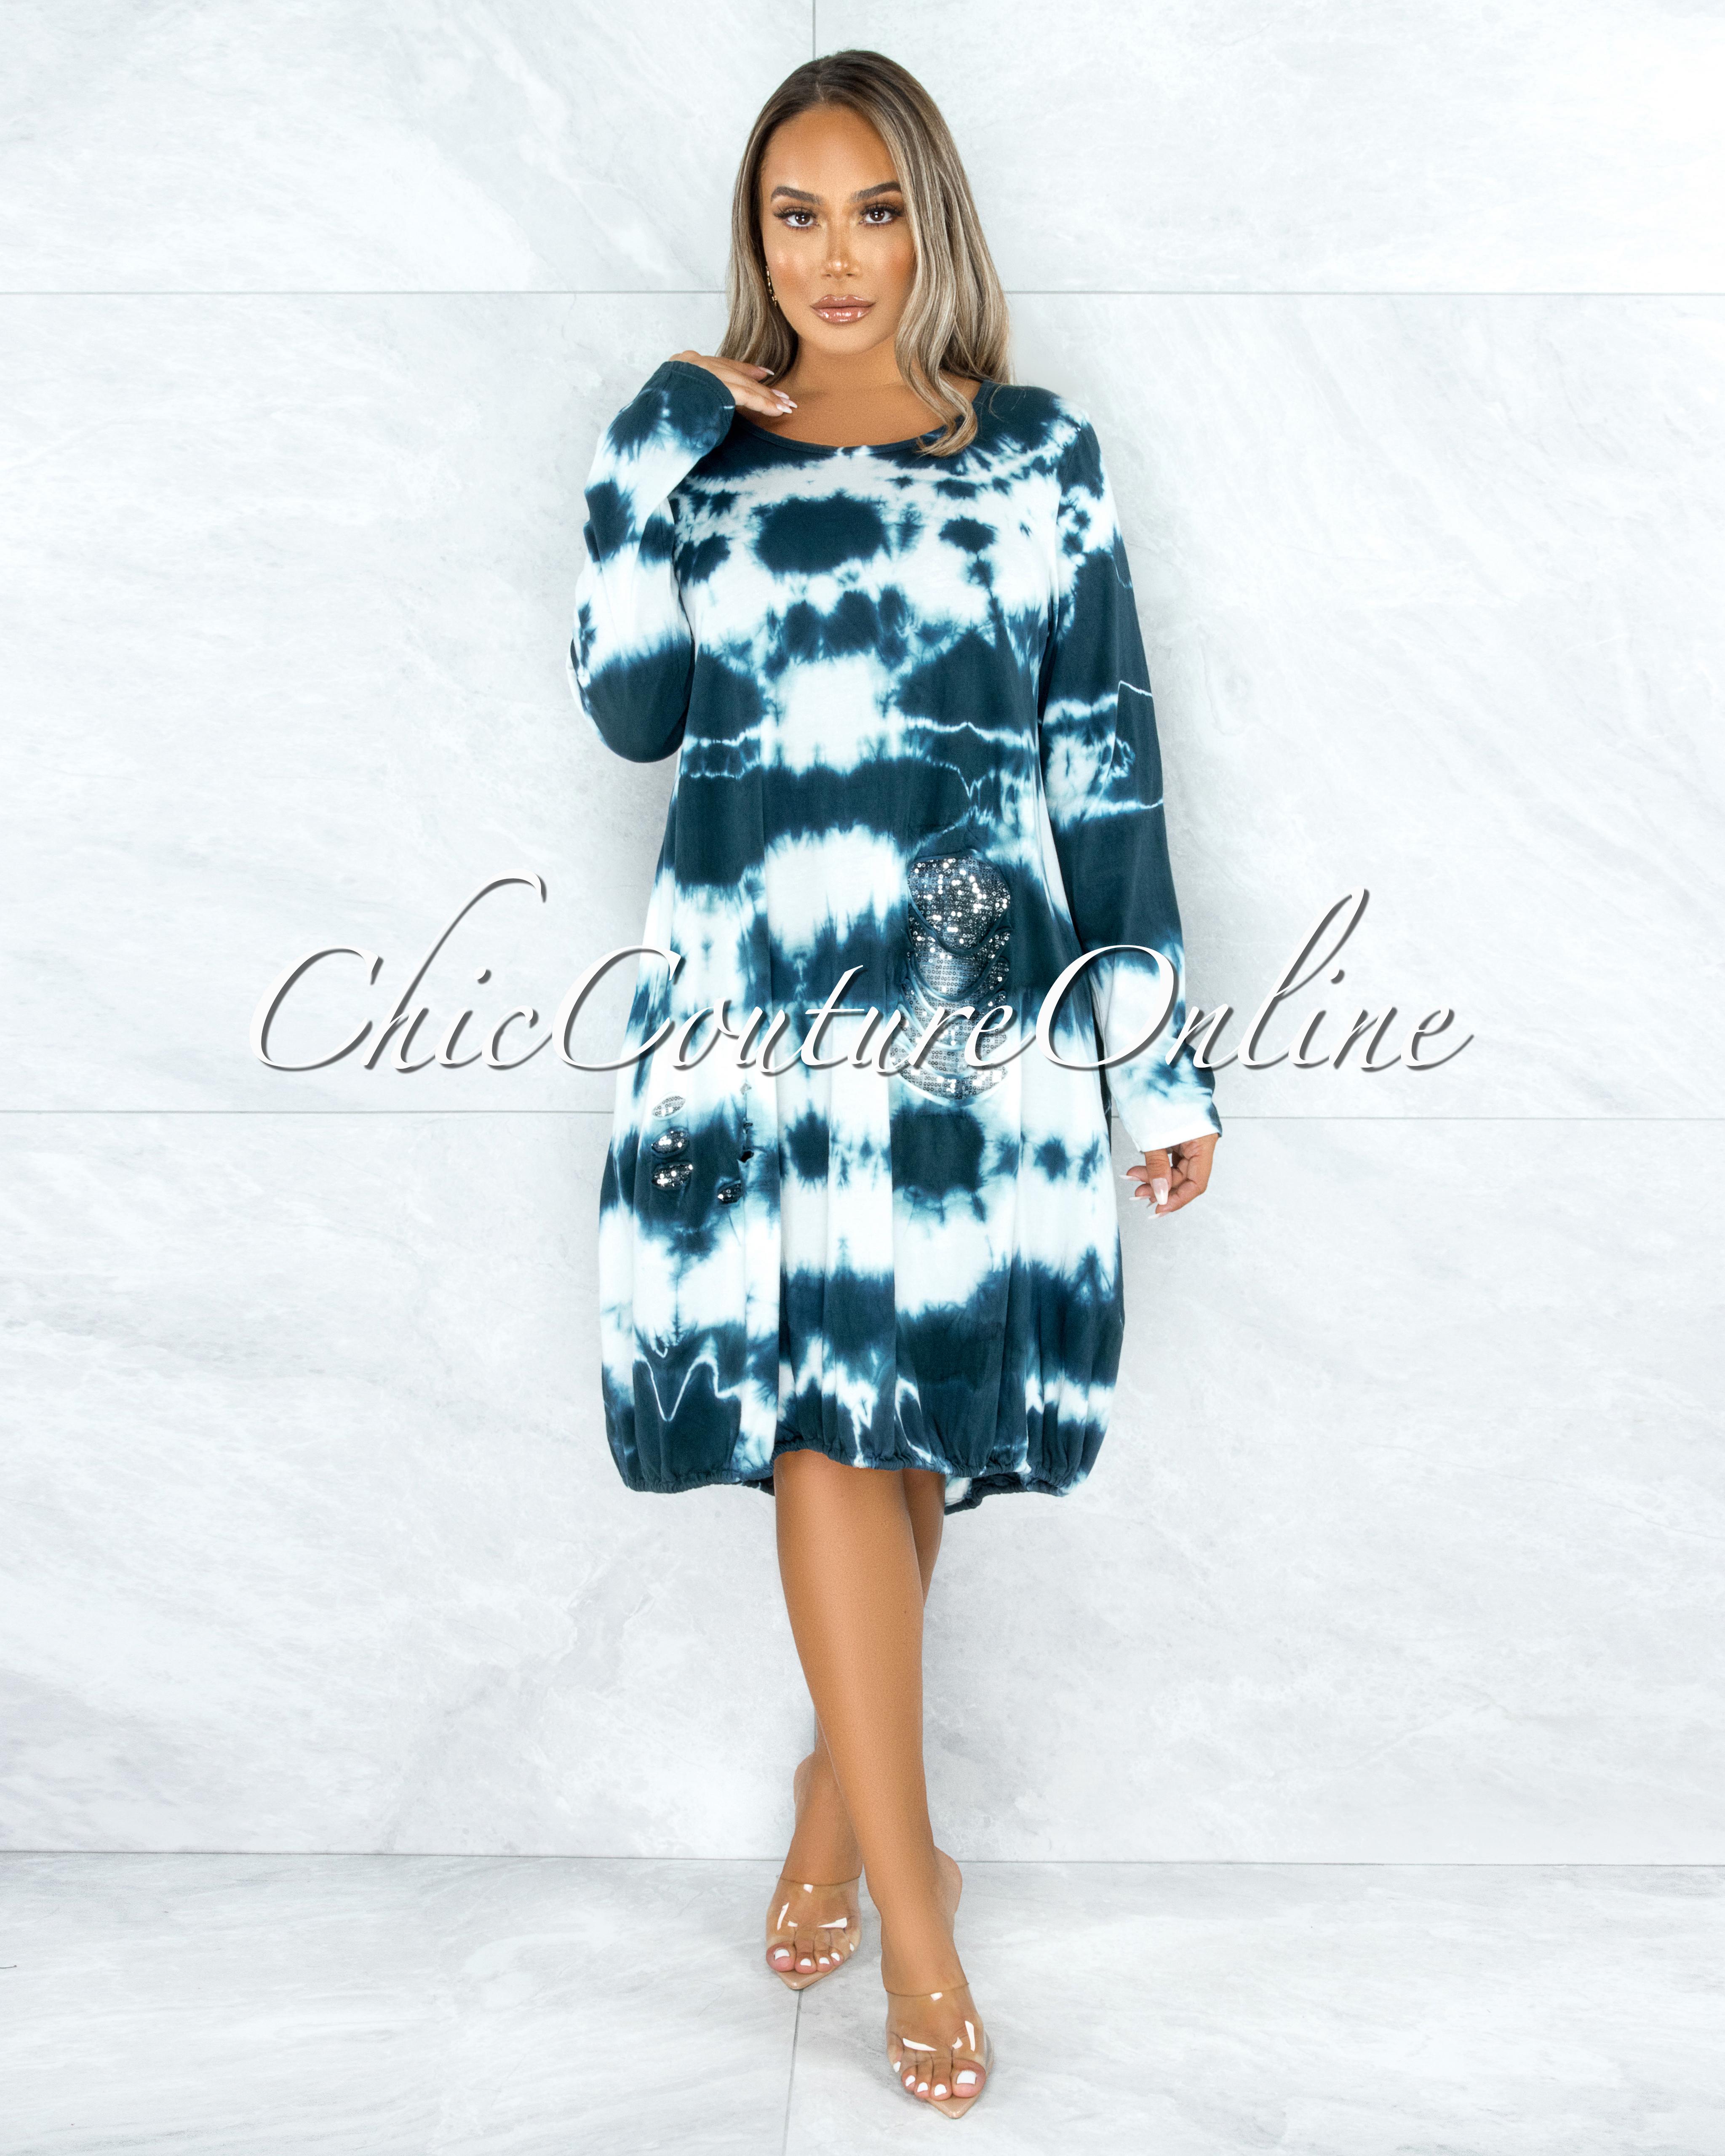 Refugia Blue Cream Tie-Dye Sequins Distressed Detail Shirt Dress